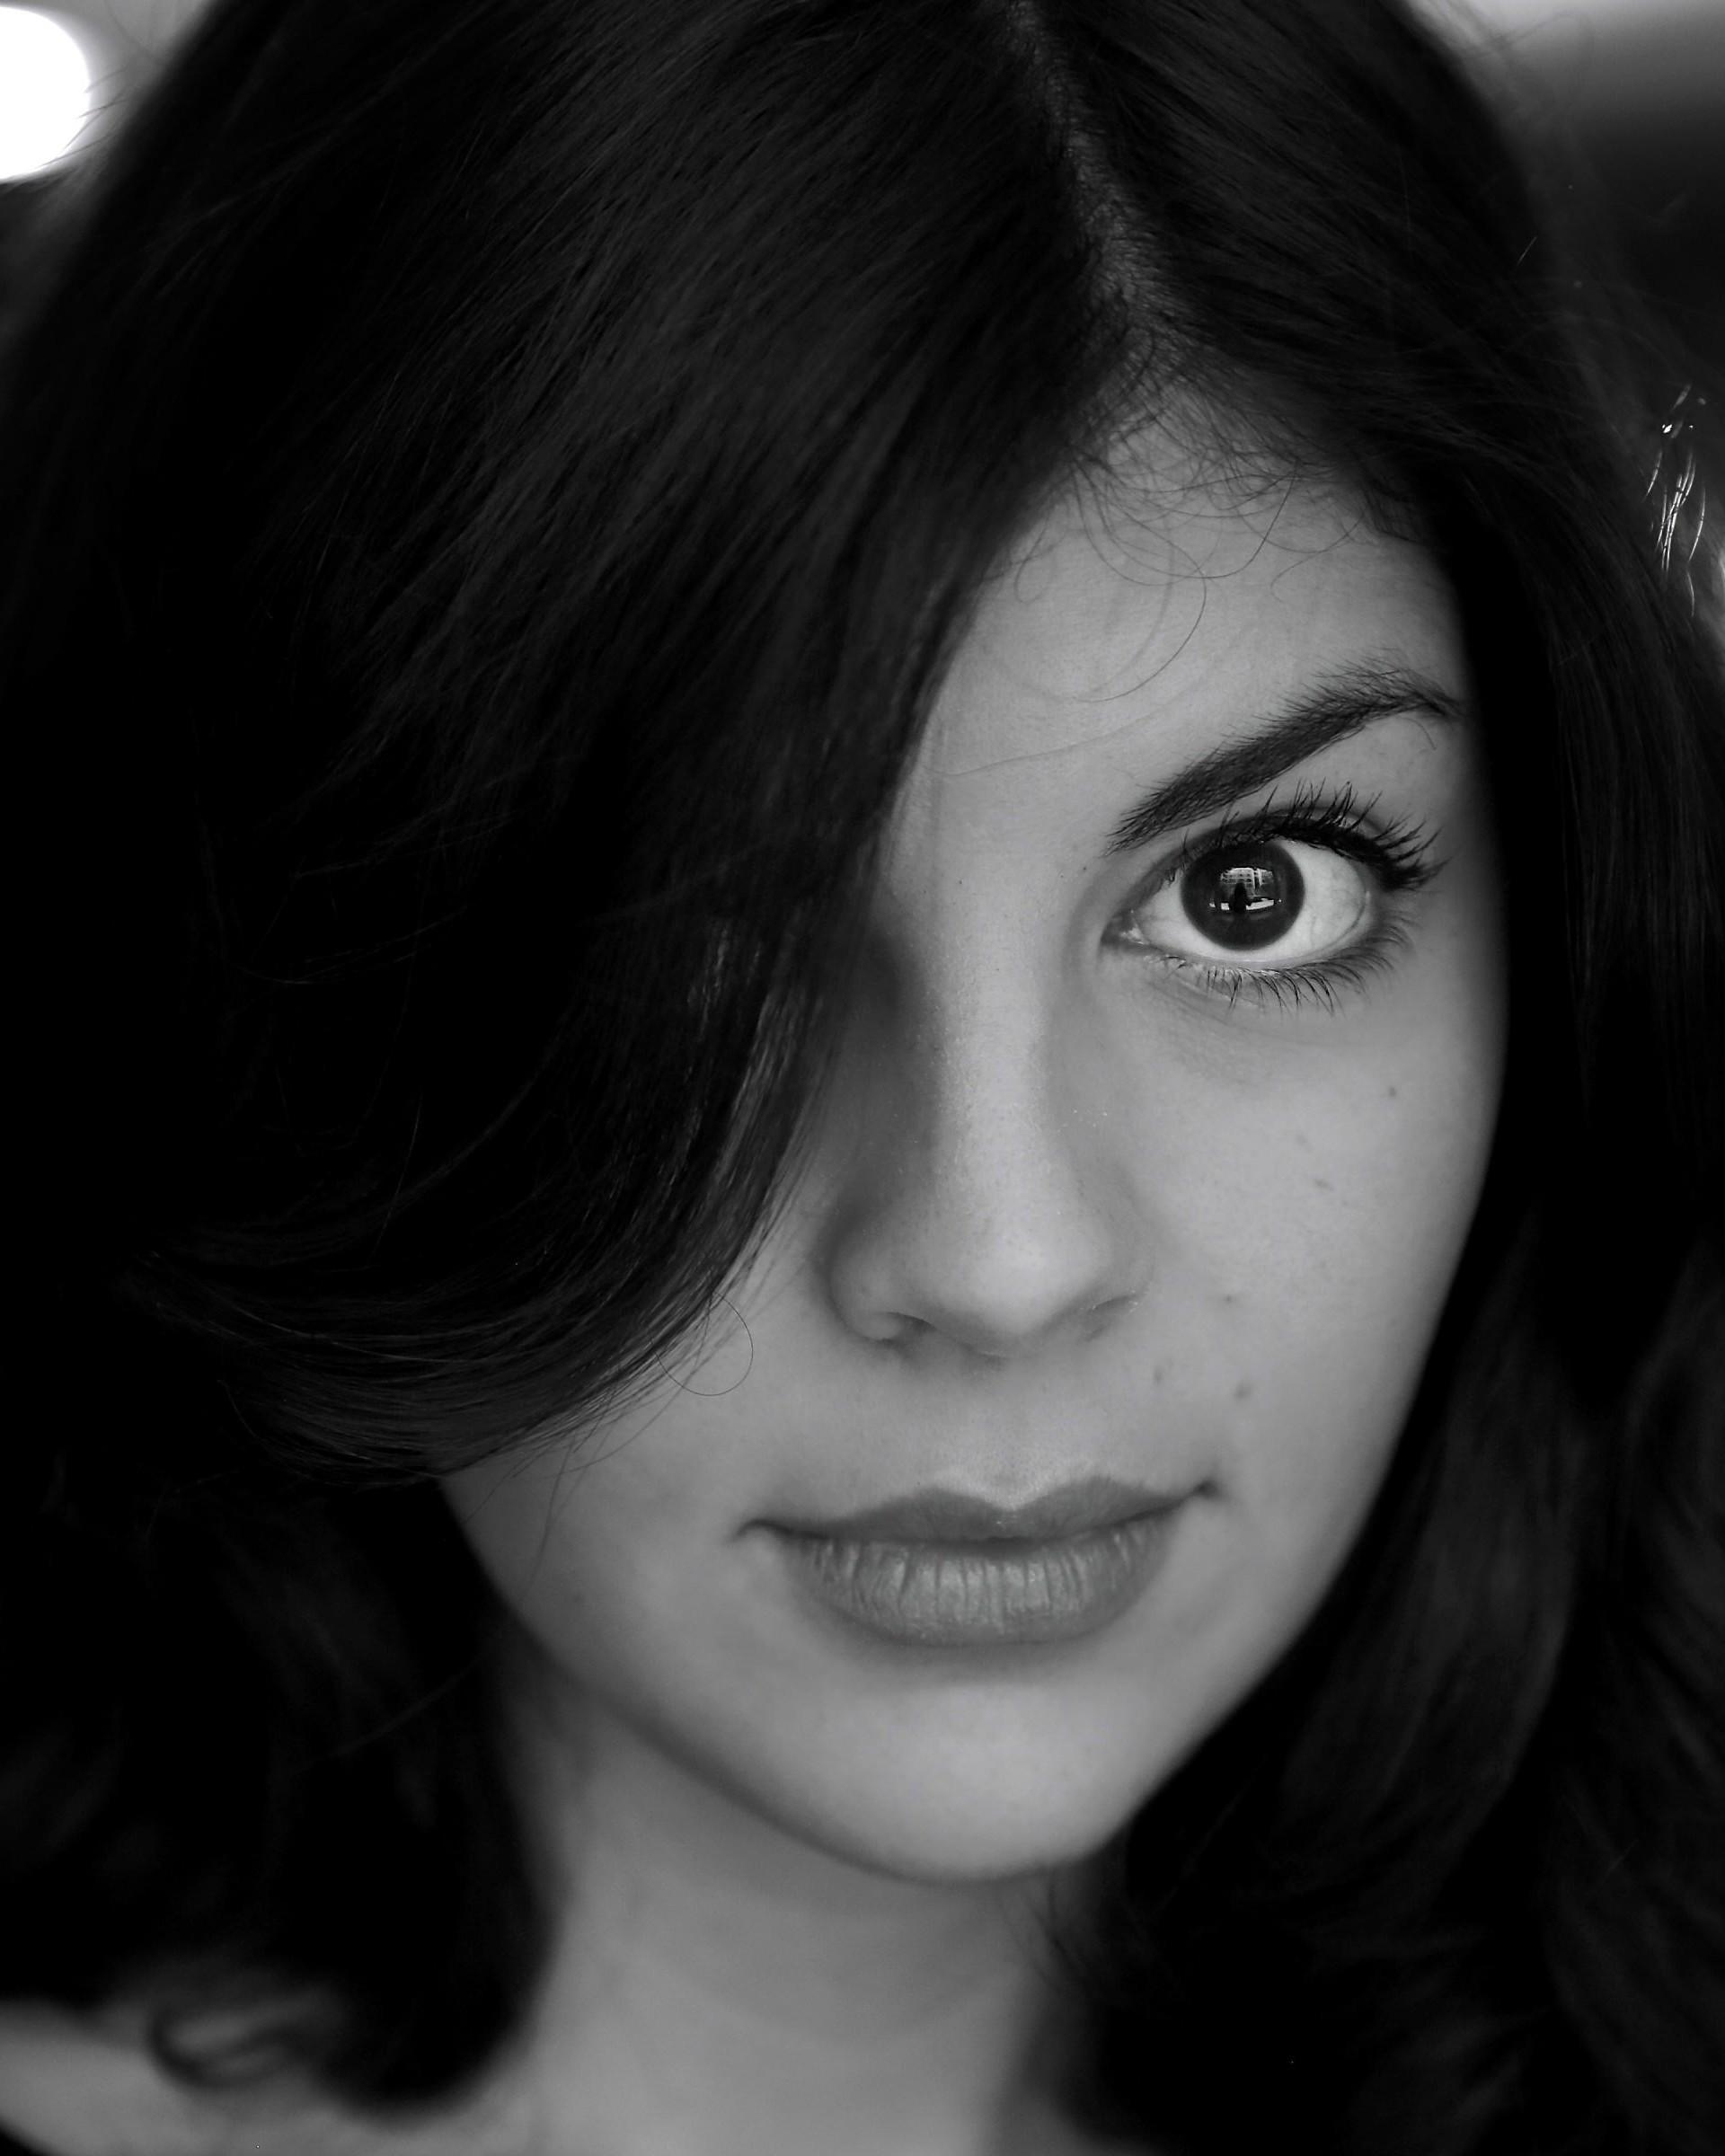 Hd wallpaper portrait - Download Nikki Yanofsky Black Amp White Portrait Hd